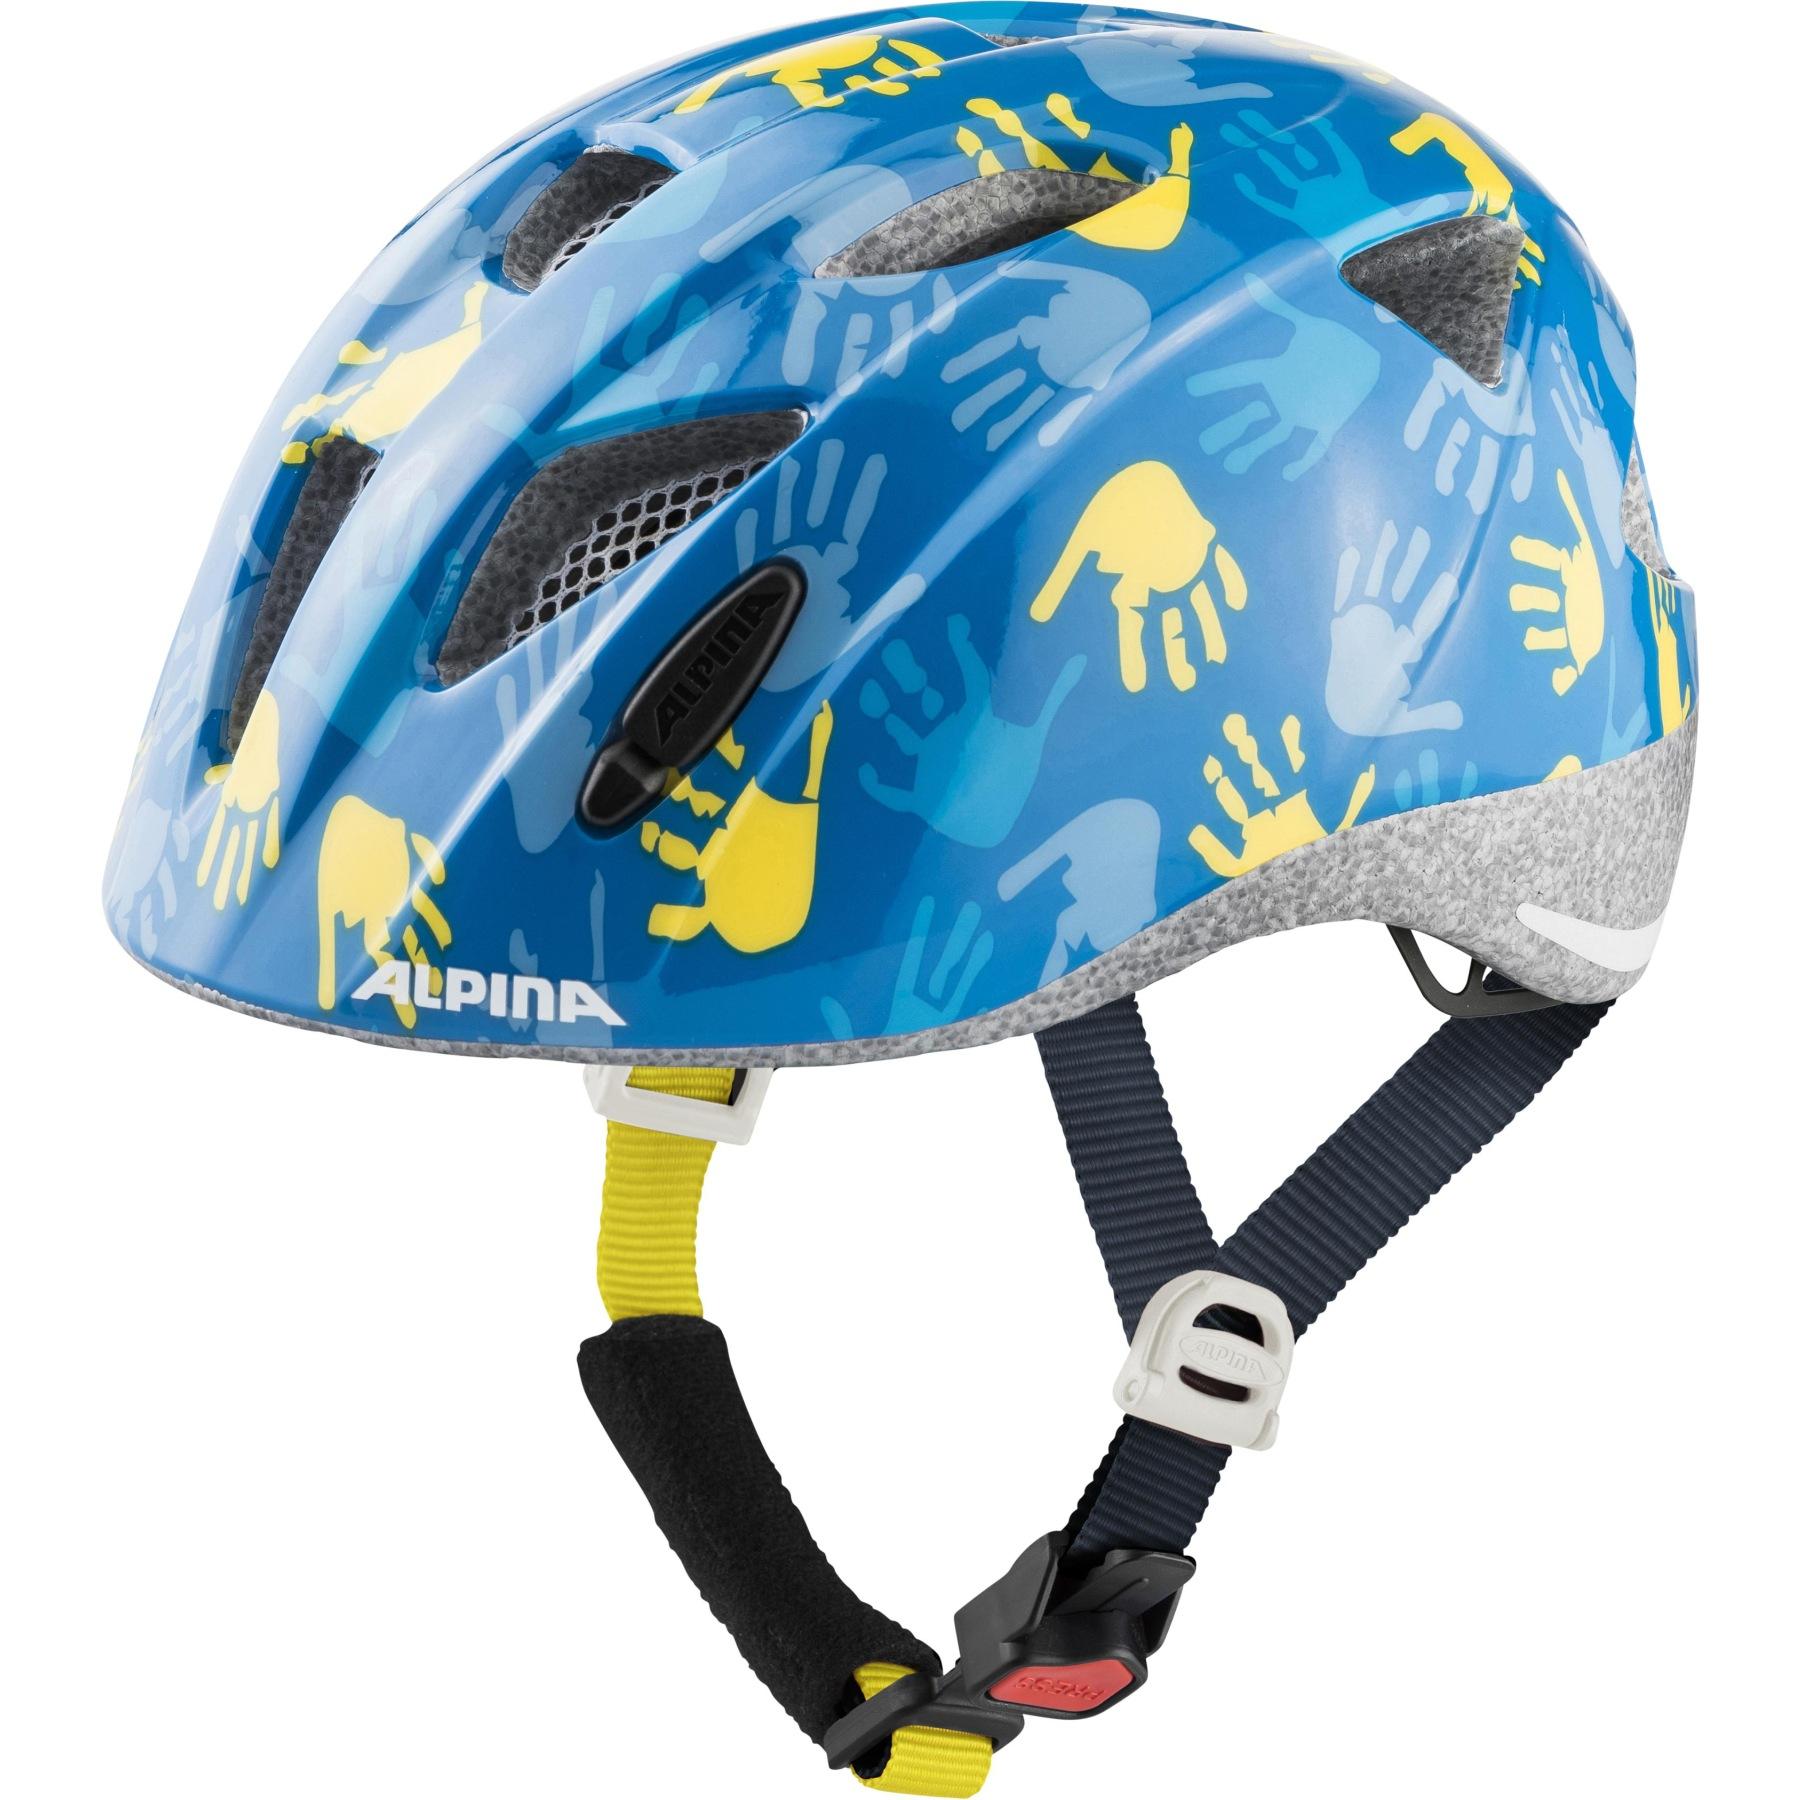 Alpina Ximo Kids Helmet - blue hands gloss